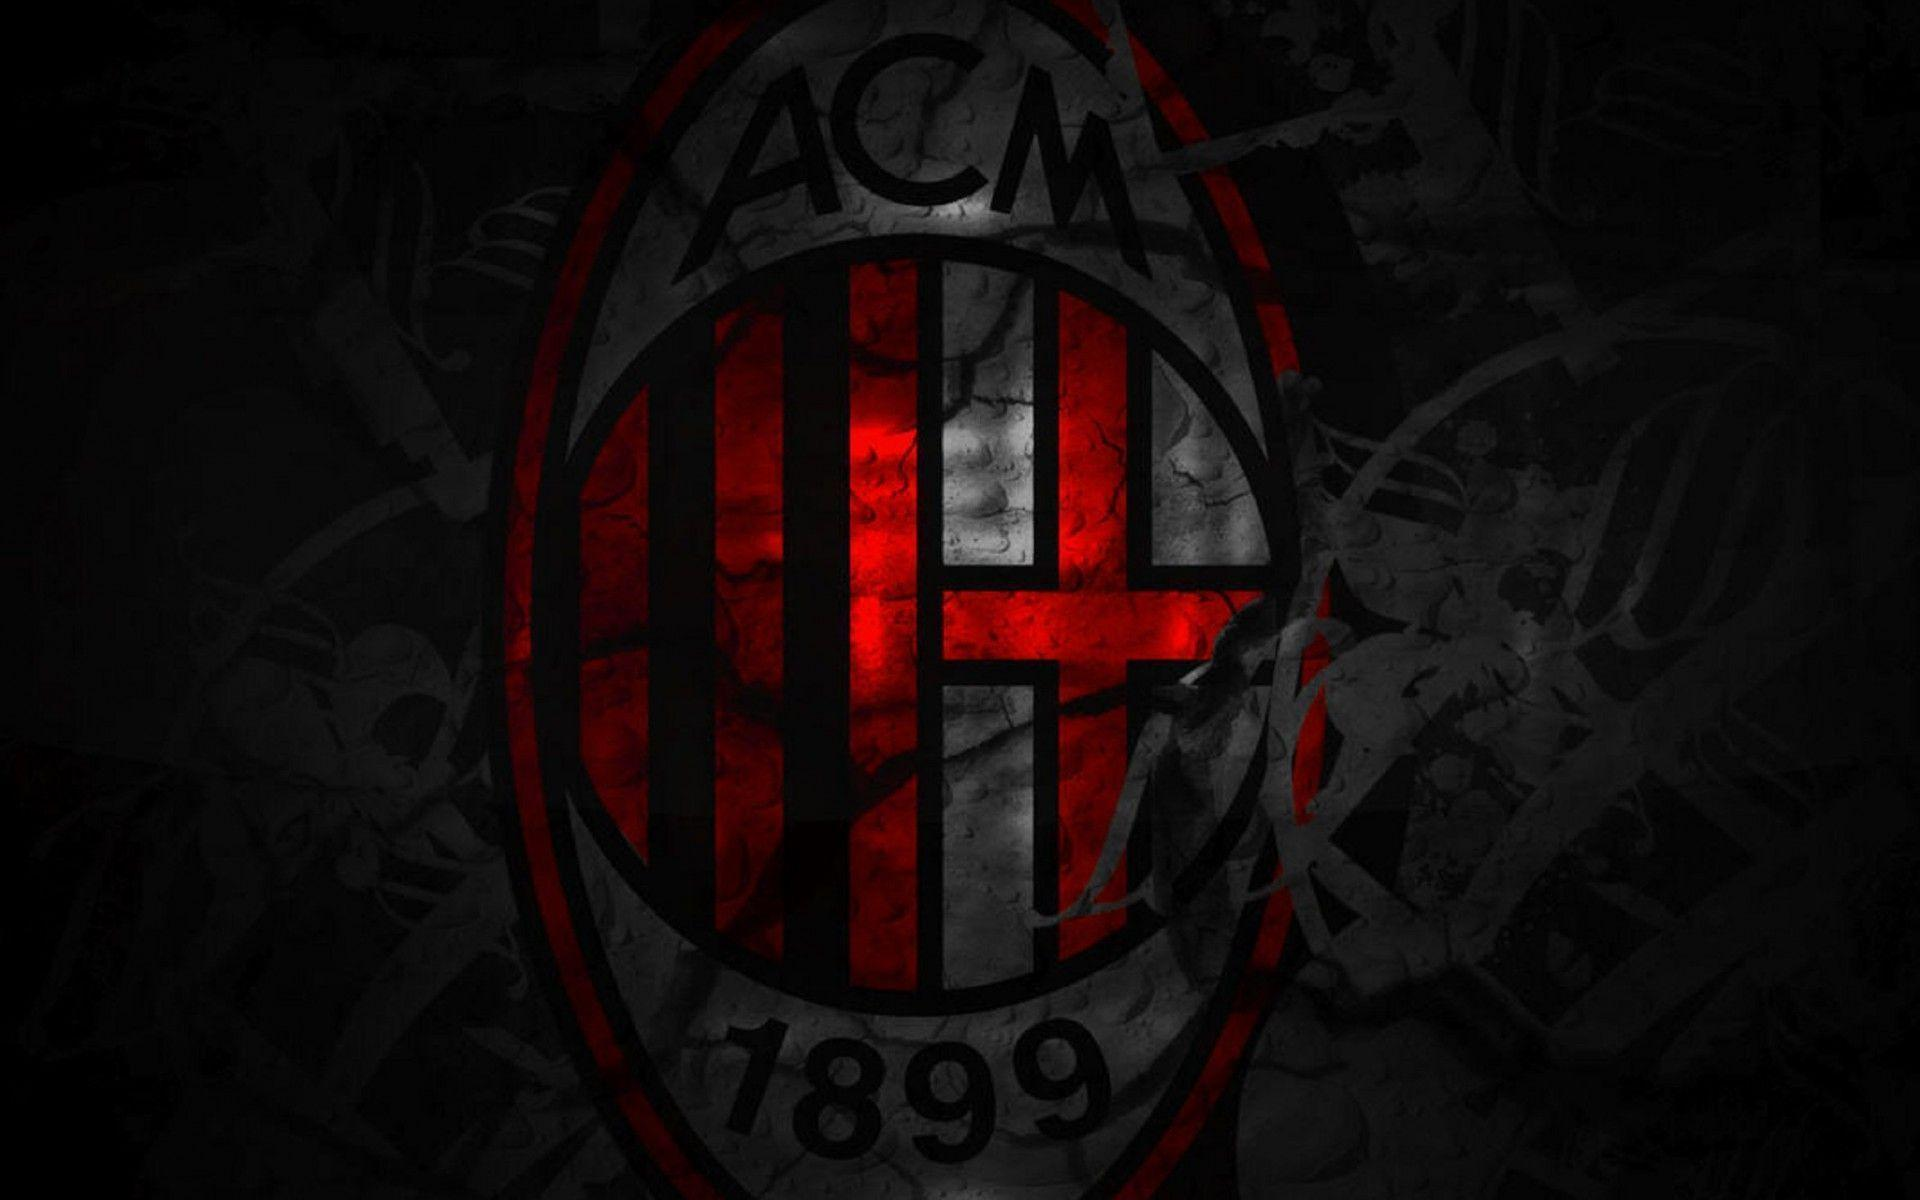 Wallpapers AC Milan 2016 - Wallpaper Cave